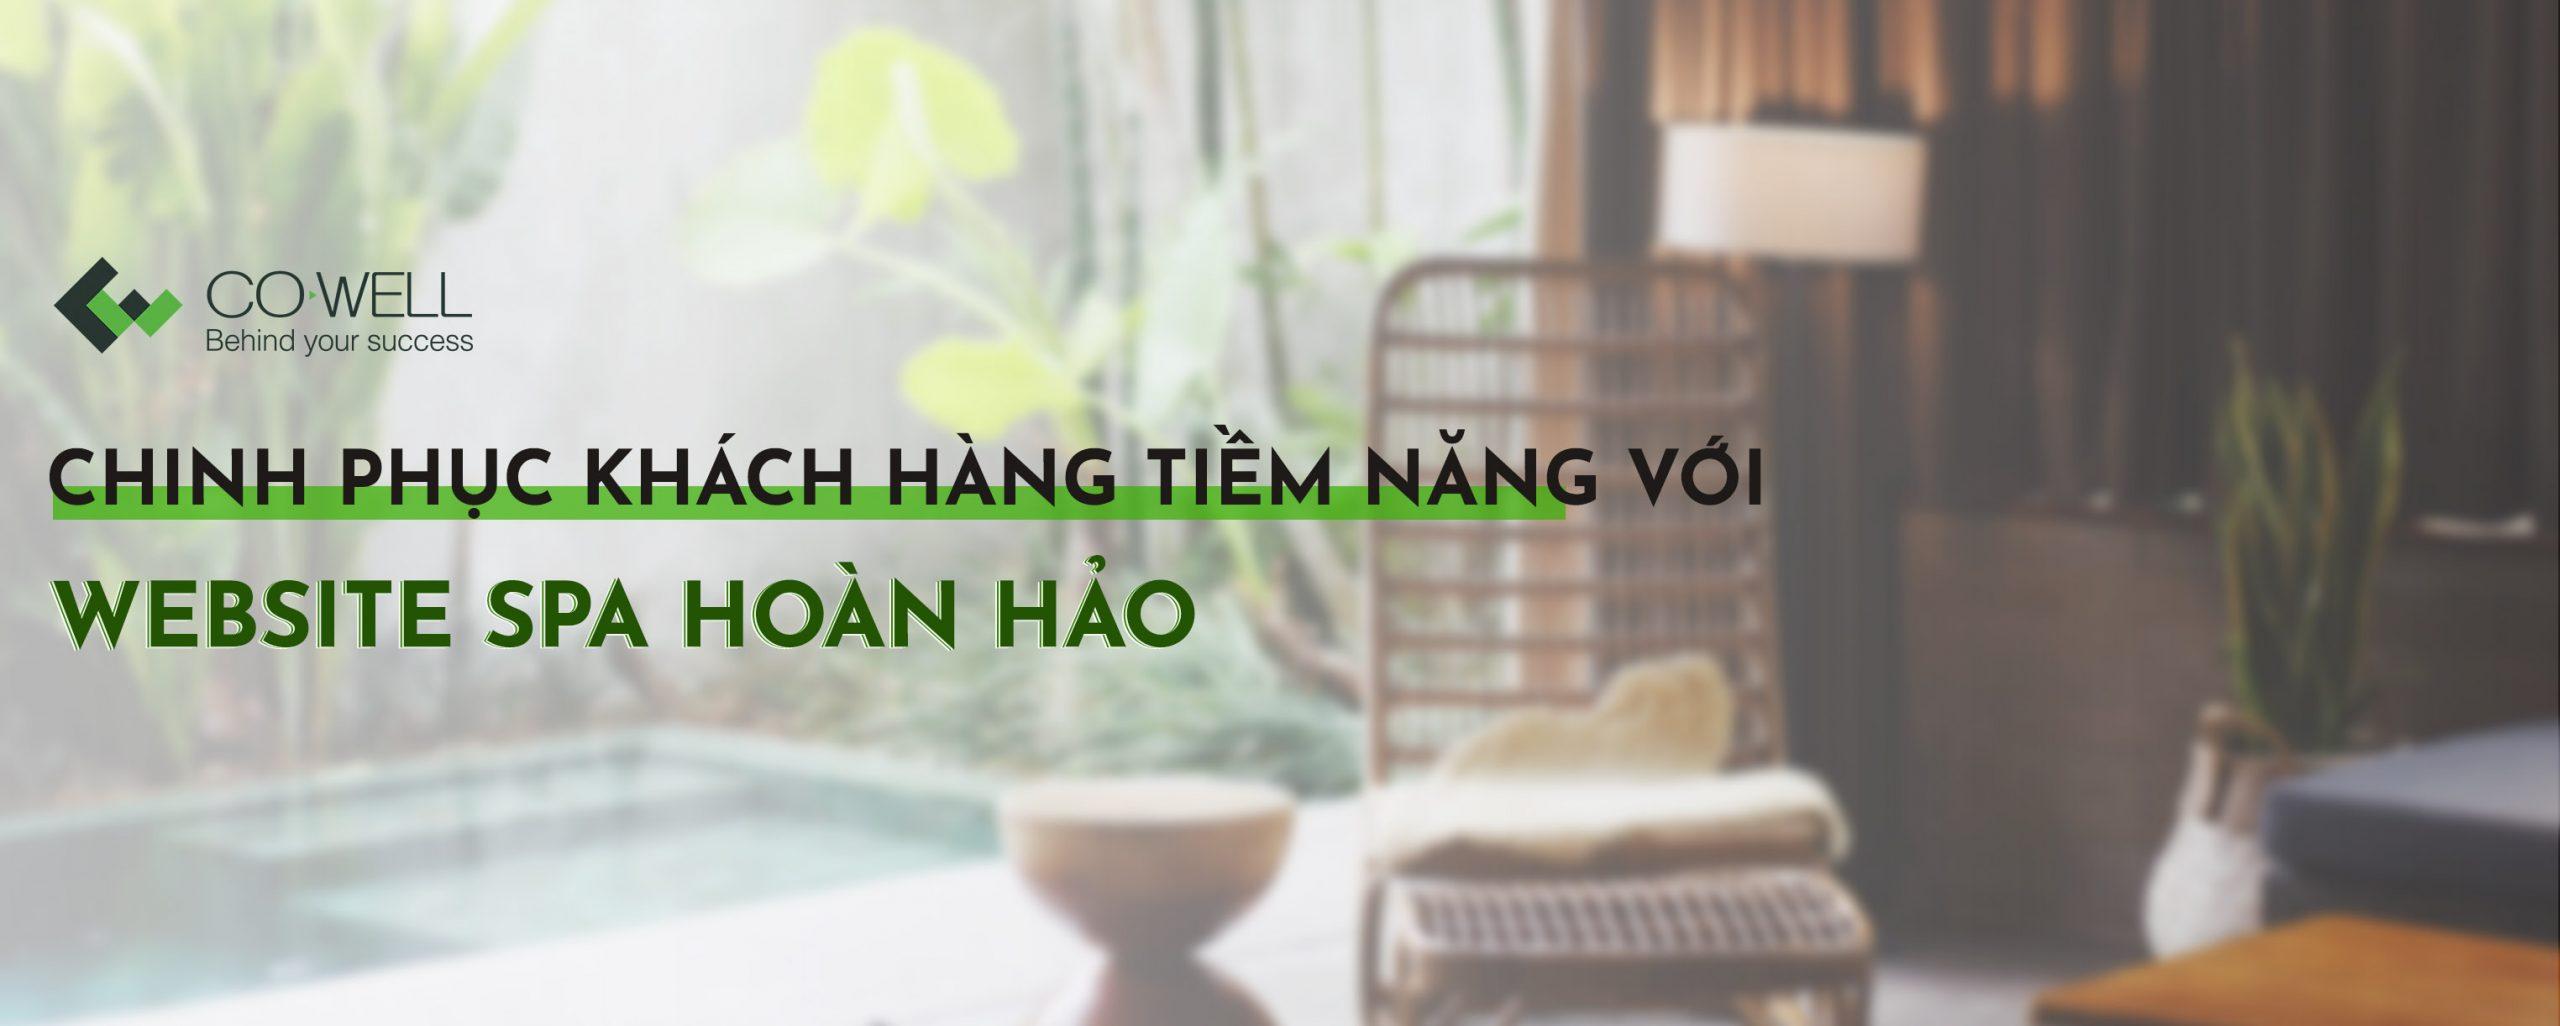 Thiet ke website spa Co well asia banner 1